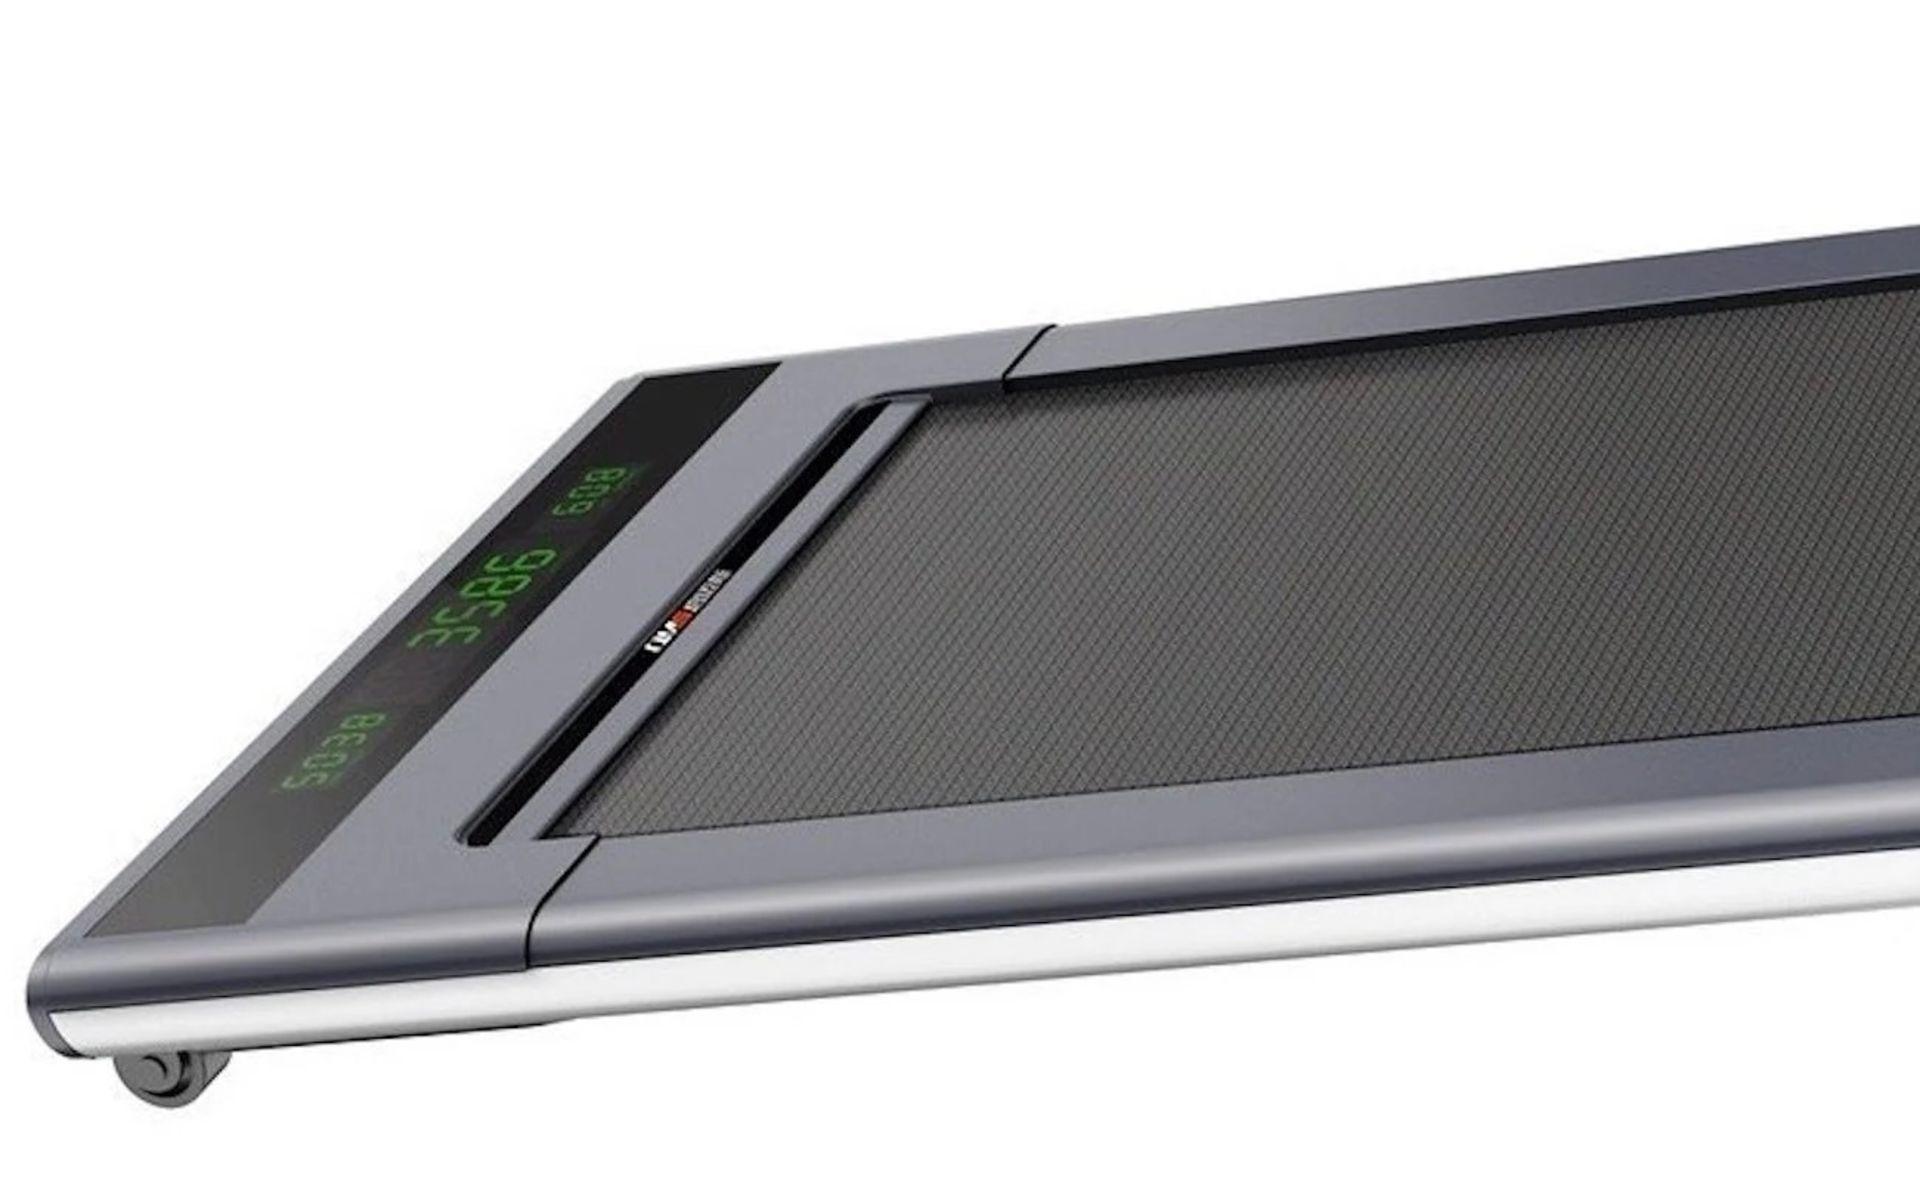 1 x Slim Tread Ultra Thin Smart Treadmill Running / Walking Machine - Lightweight With Folding - Image 20 of 23